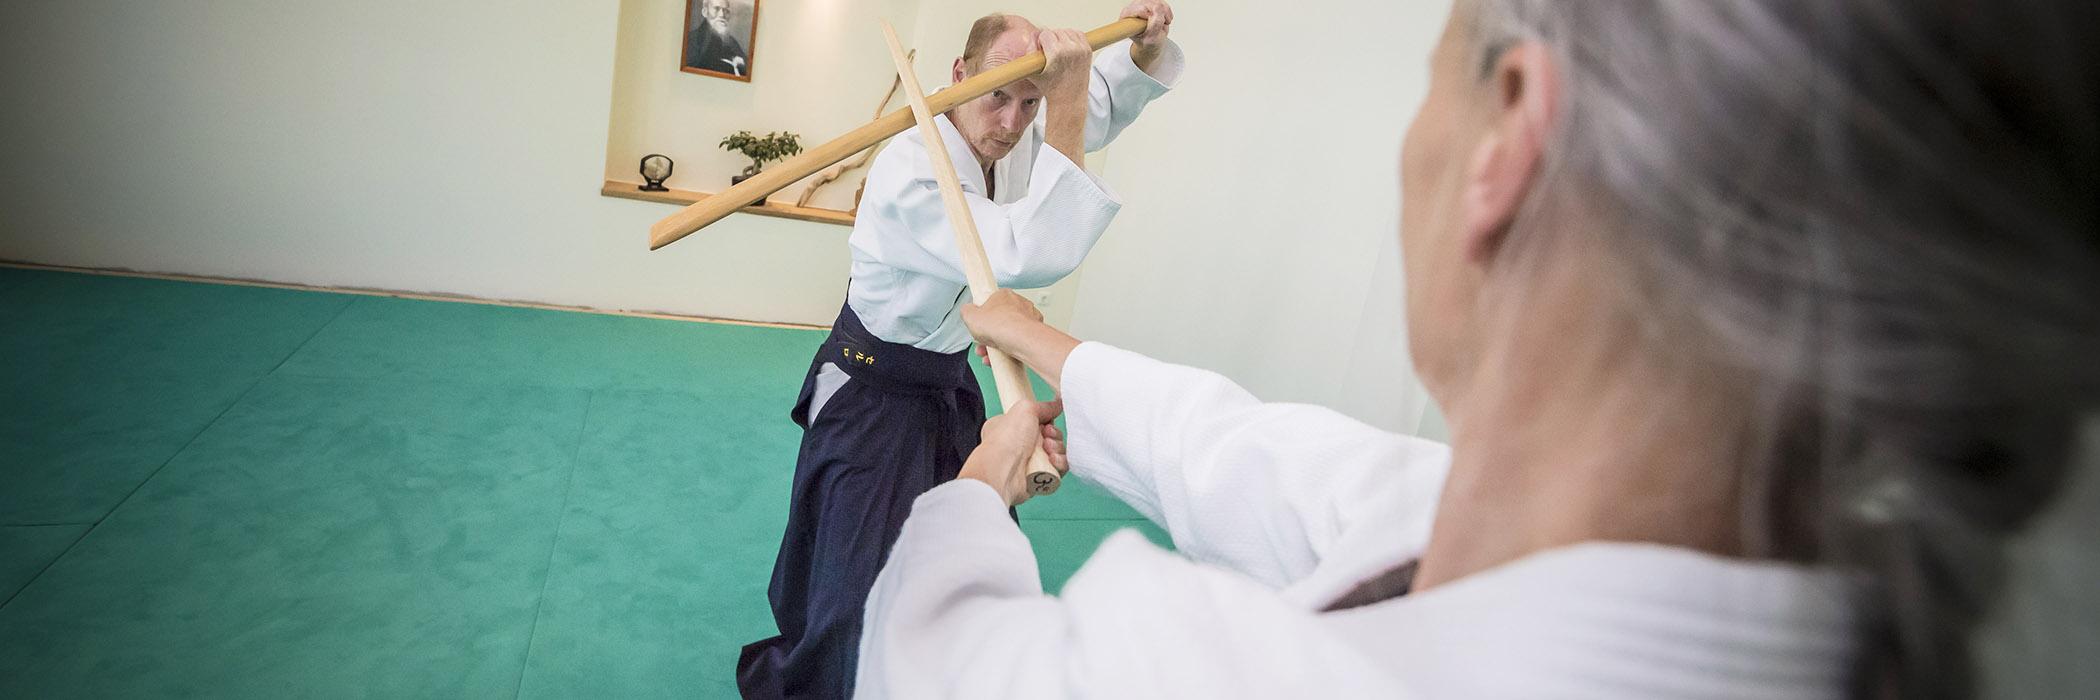 http://www.aikido-schule-bielefeld.de/wp-content/uploads/2018/12/dojoslider15.jpg